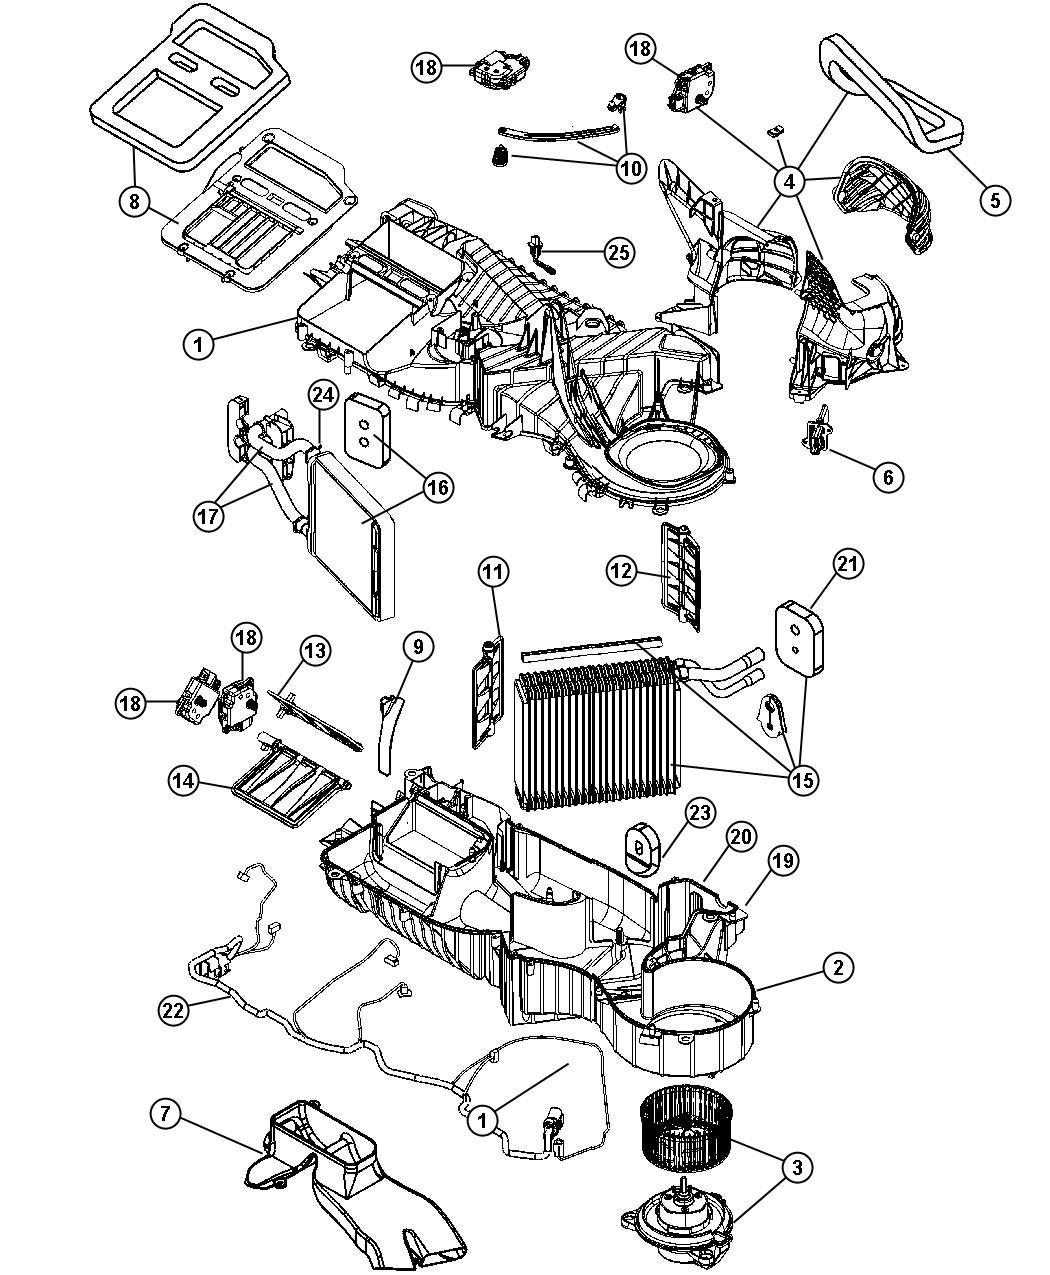 Air Conditioning Unit Air Conditioning Unit With Heater